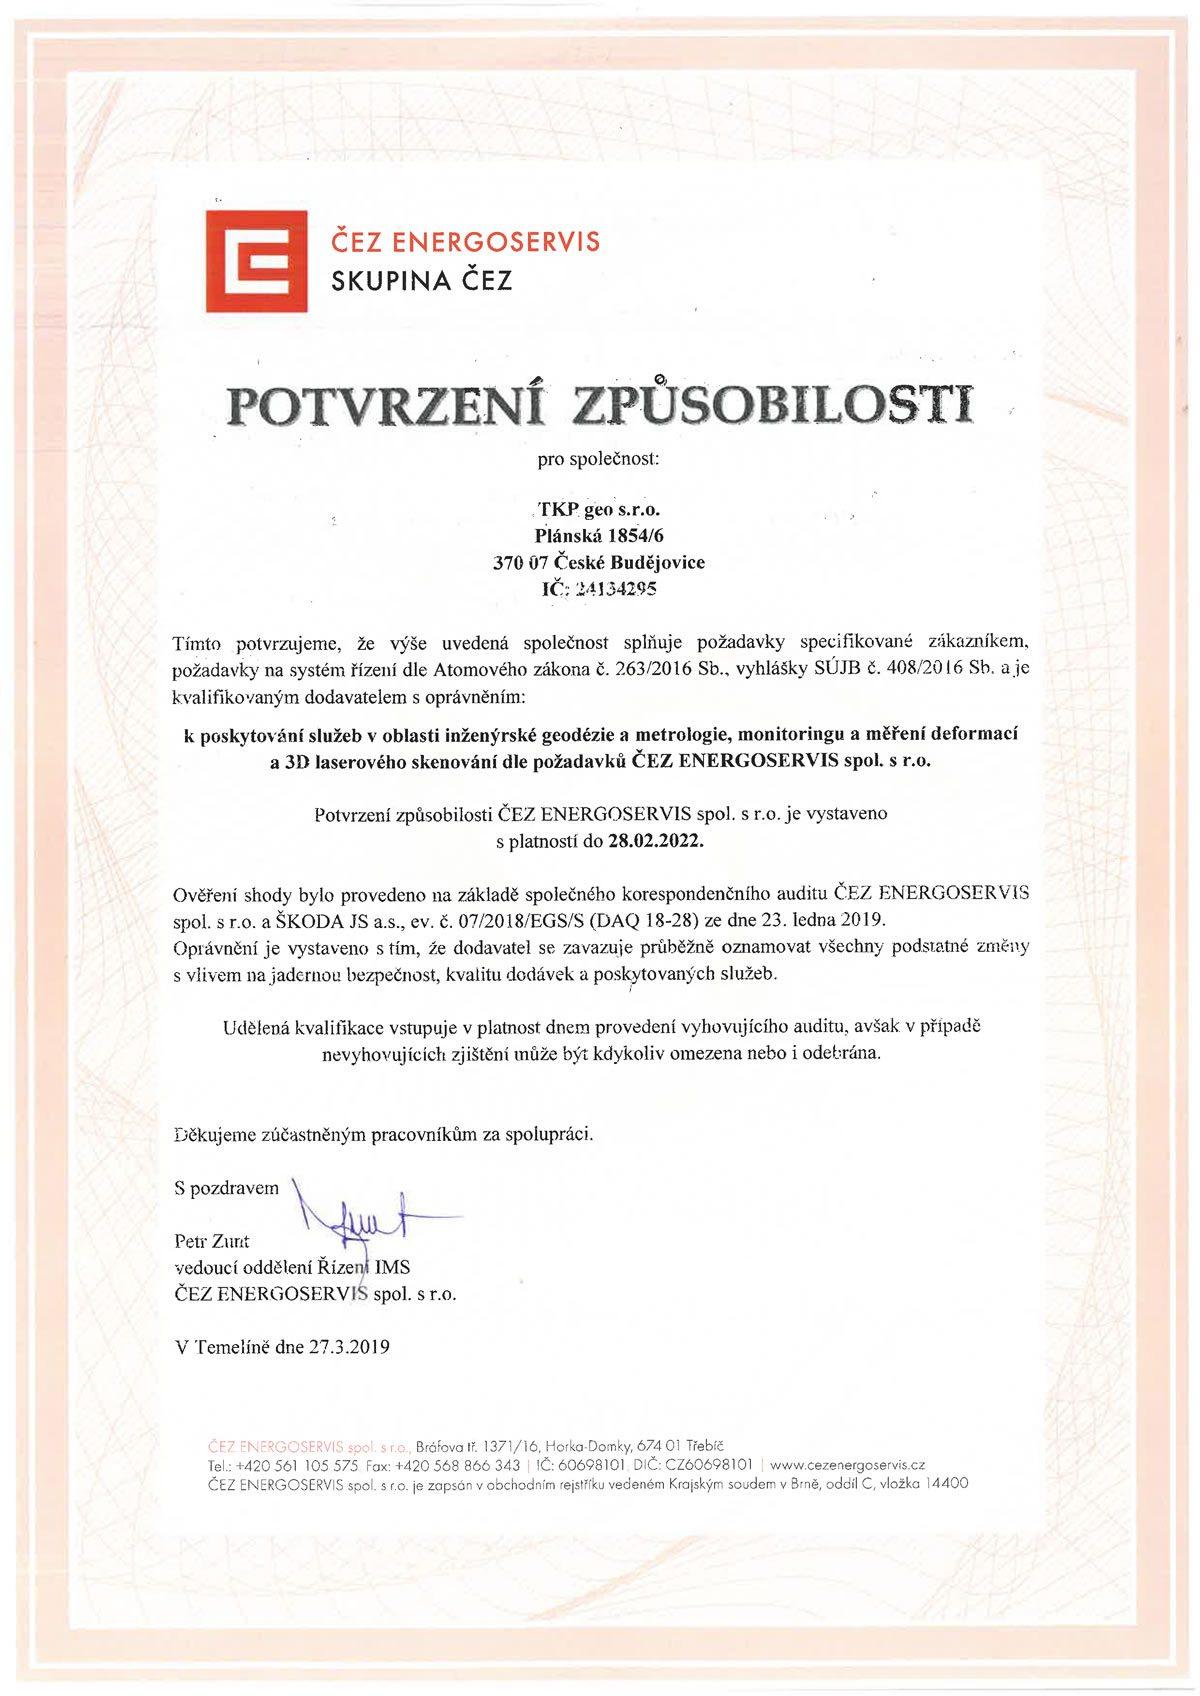 tkp-geo-certifikat-CEZ-Energoservis-2019-2022 / GeoBusiness